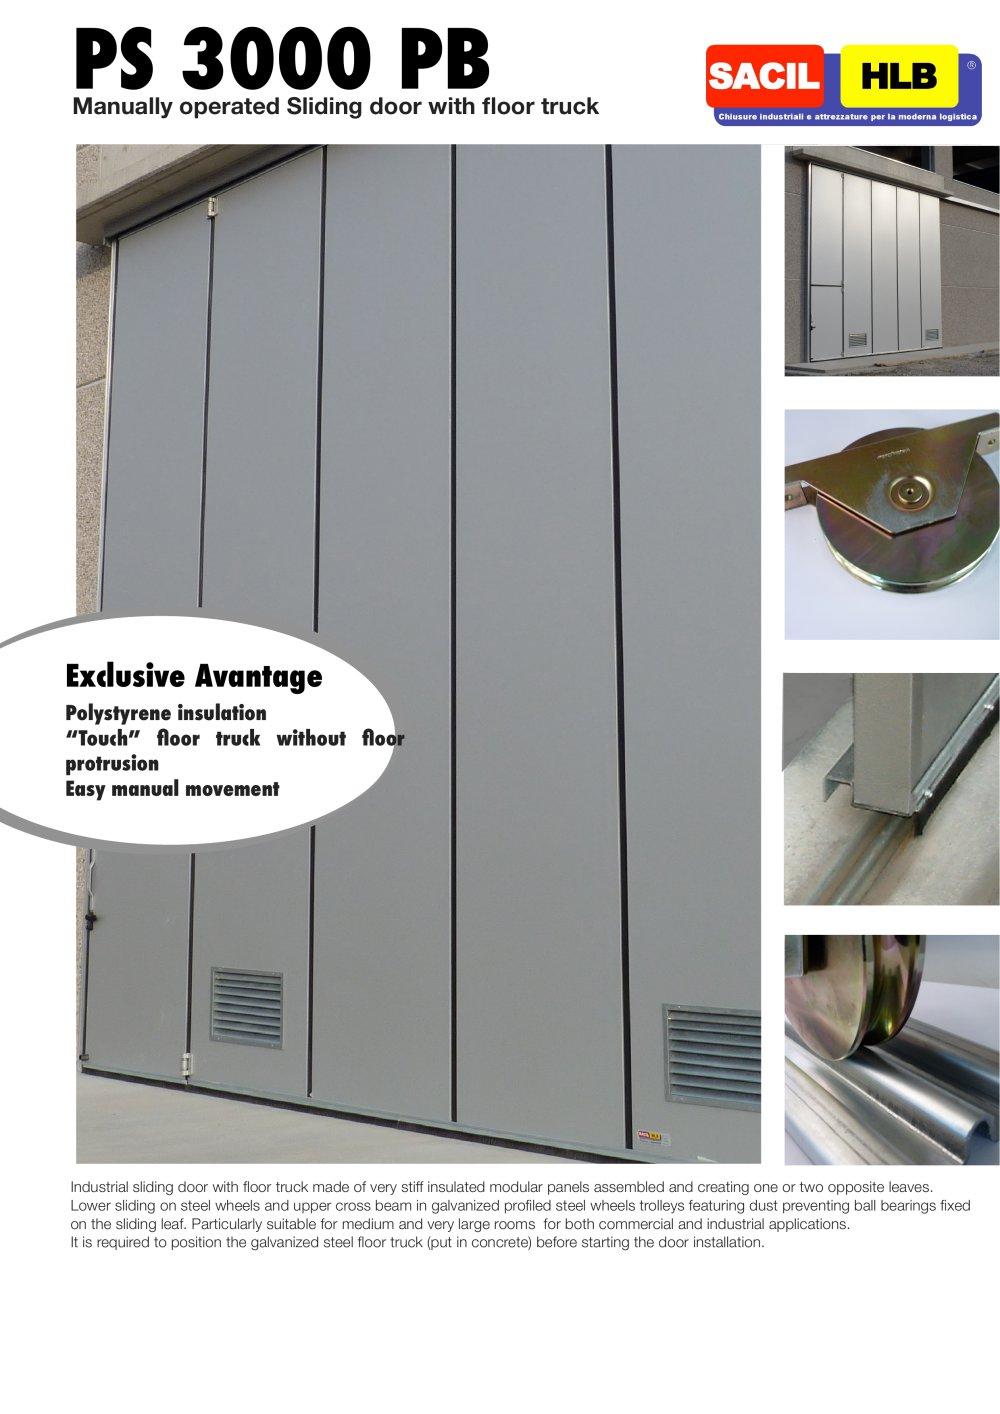 Sliding Doors With Floor Track Ps 3000 Pb Sacil Hlb Pdf